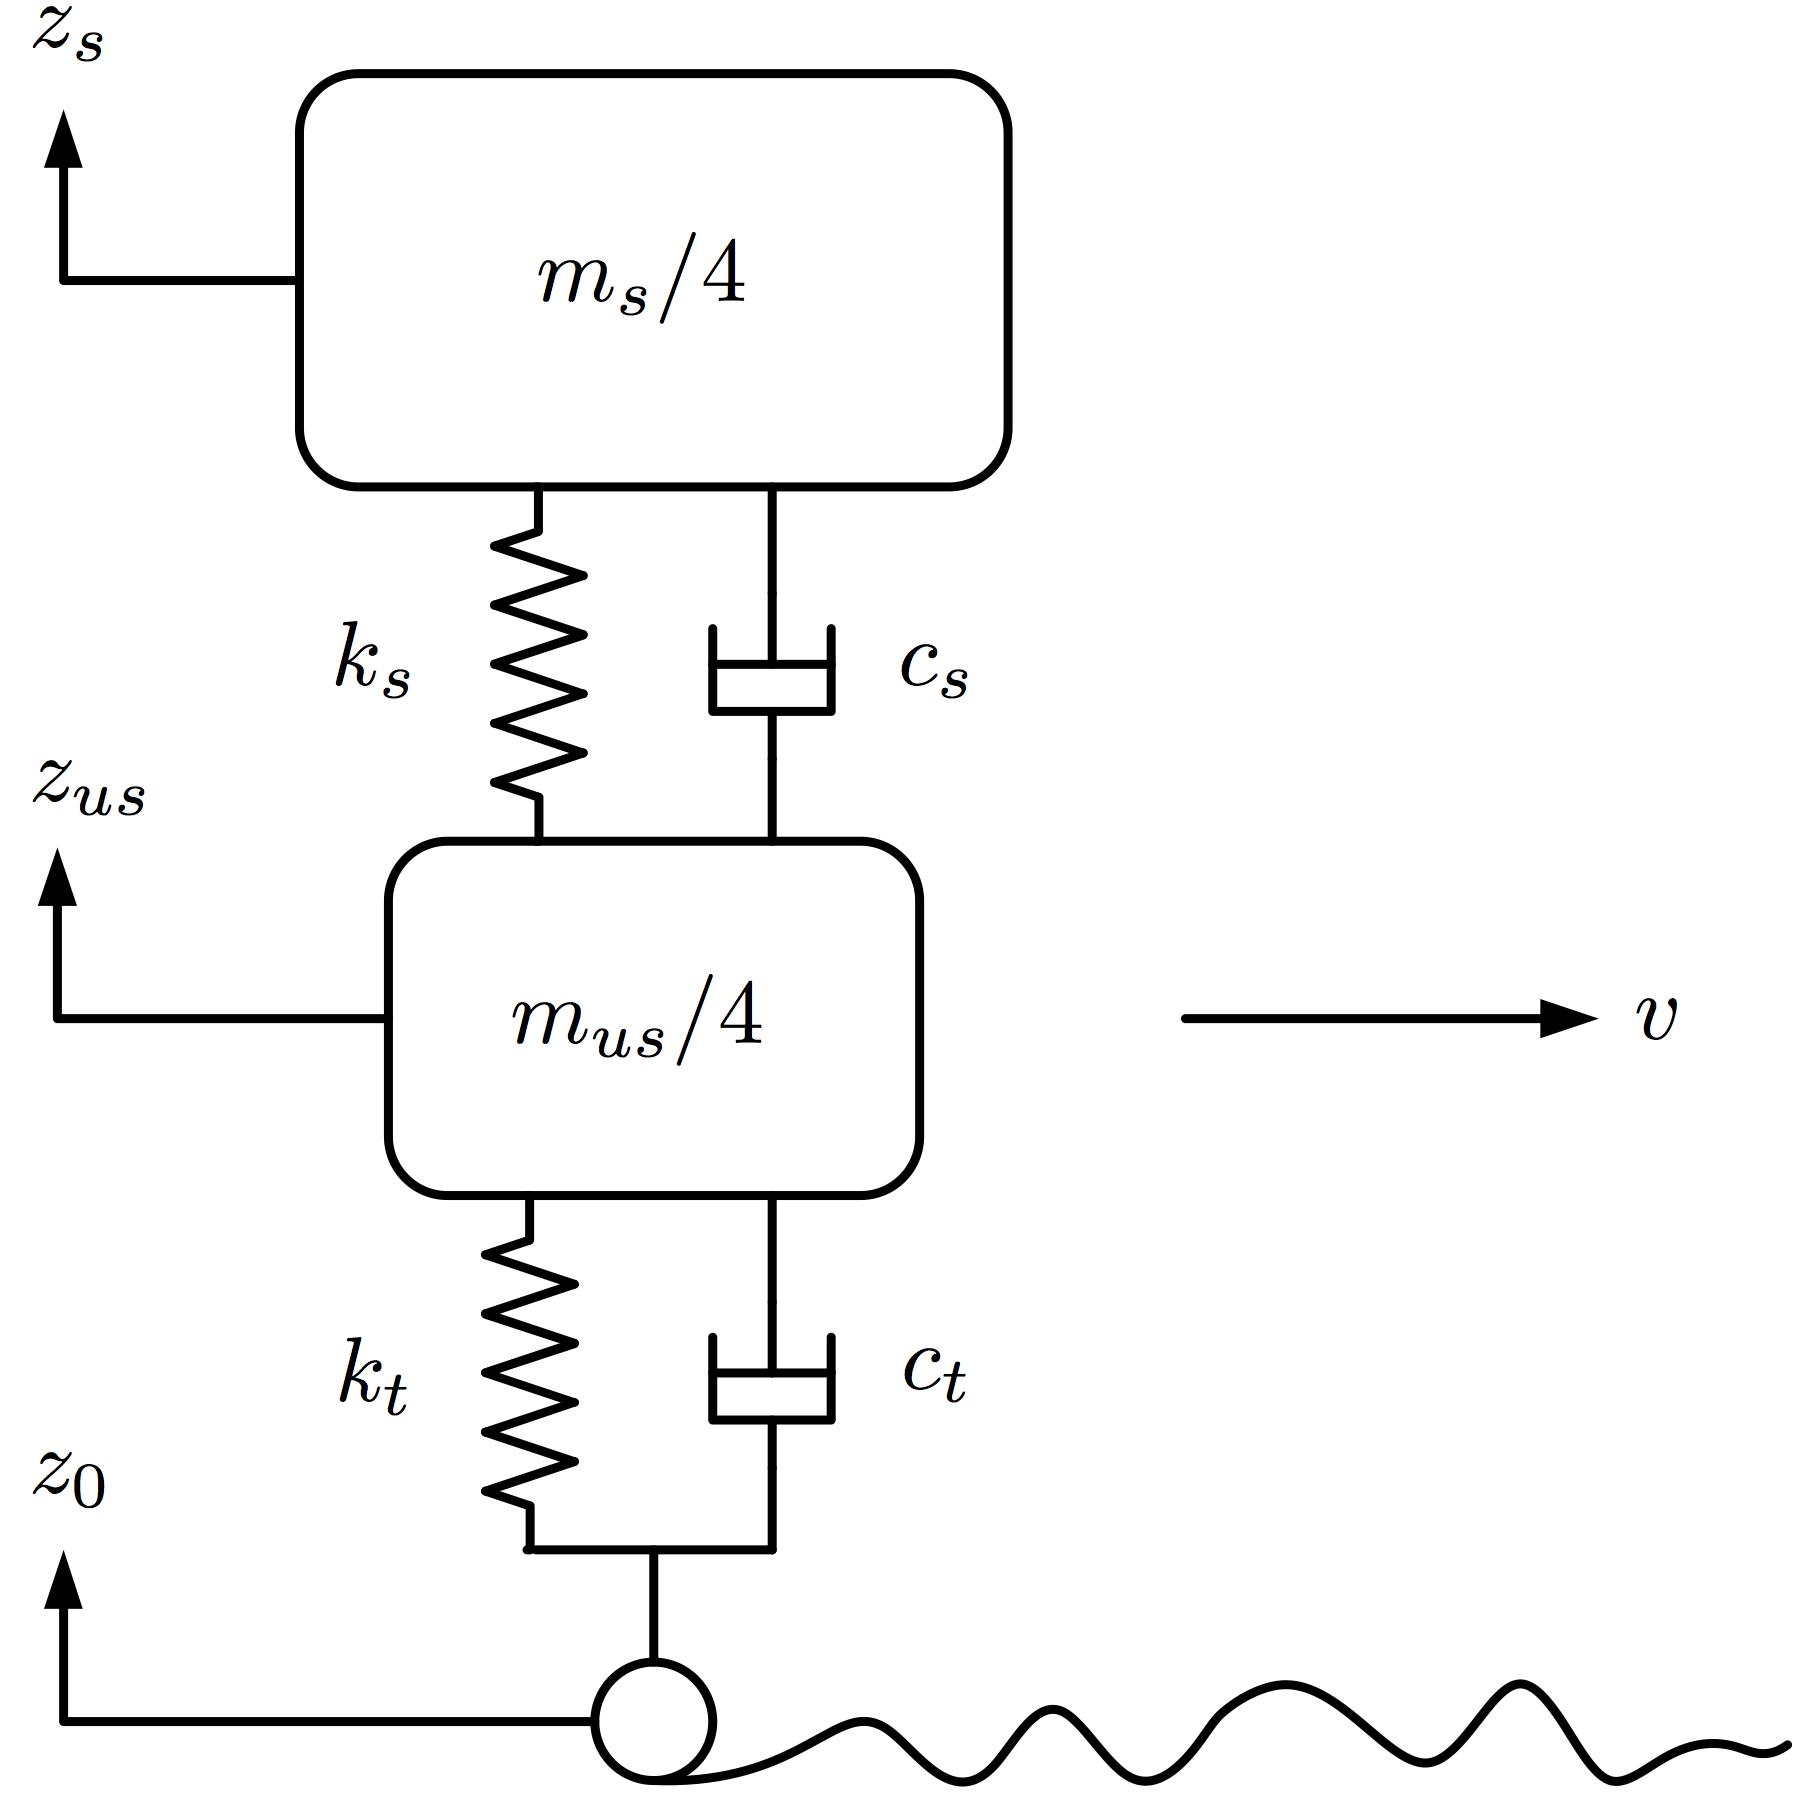 Co-Design of an Active Automotive Suspension Using DT